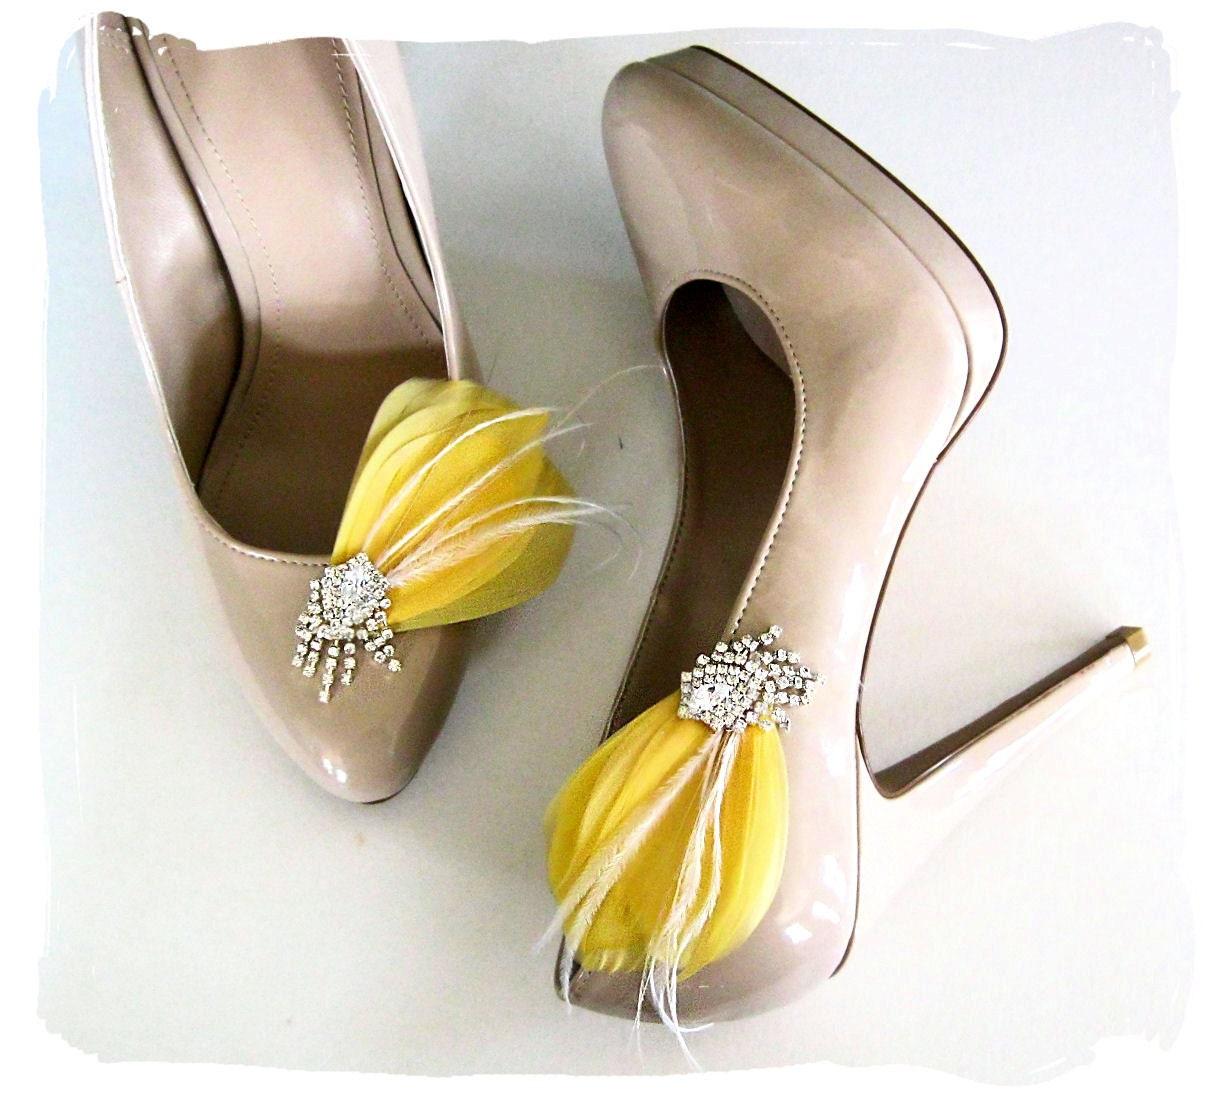 And Rhinestone Shoe Clips